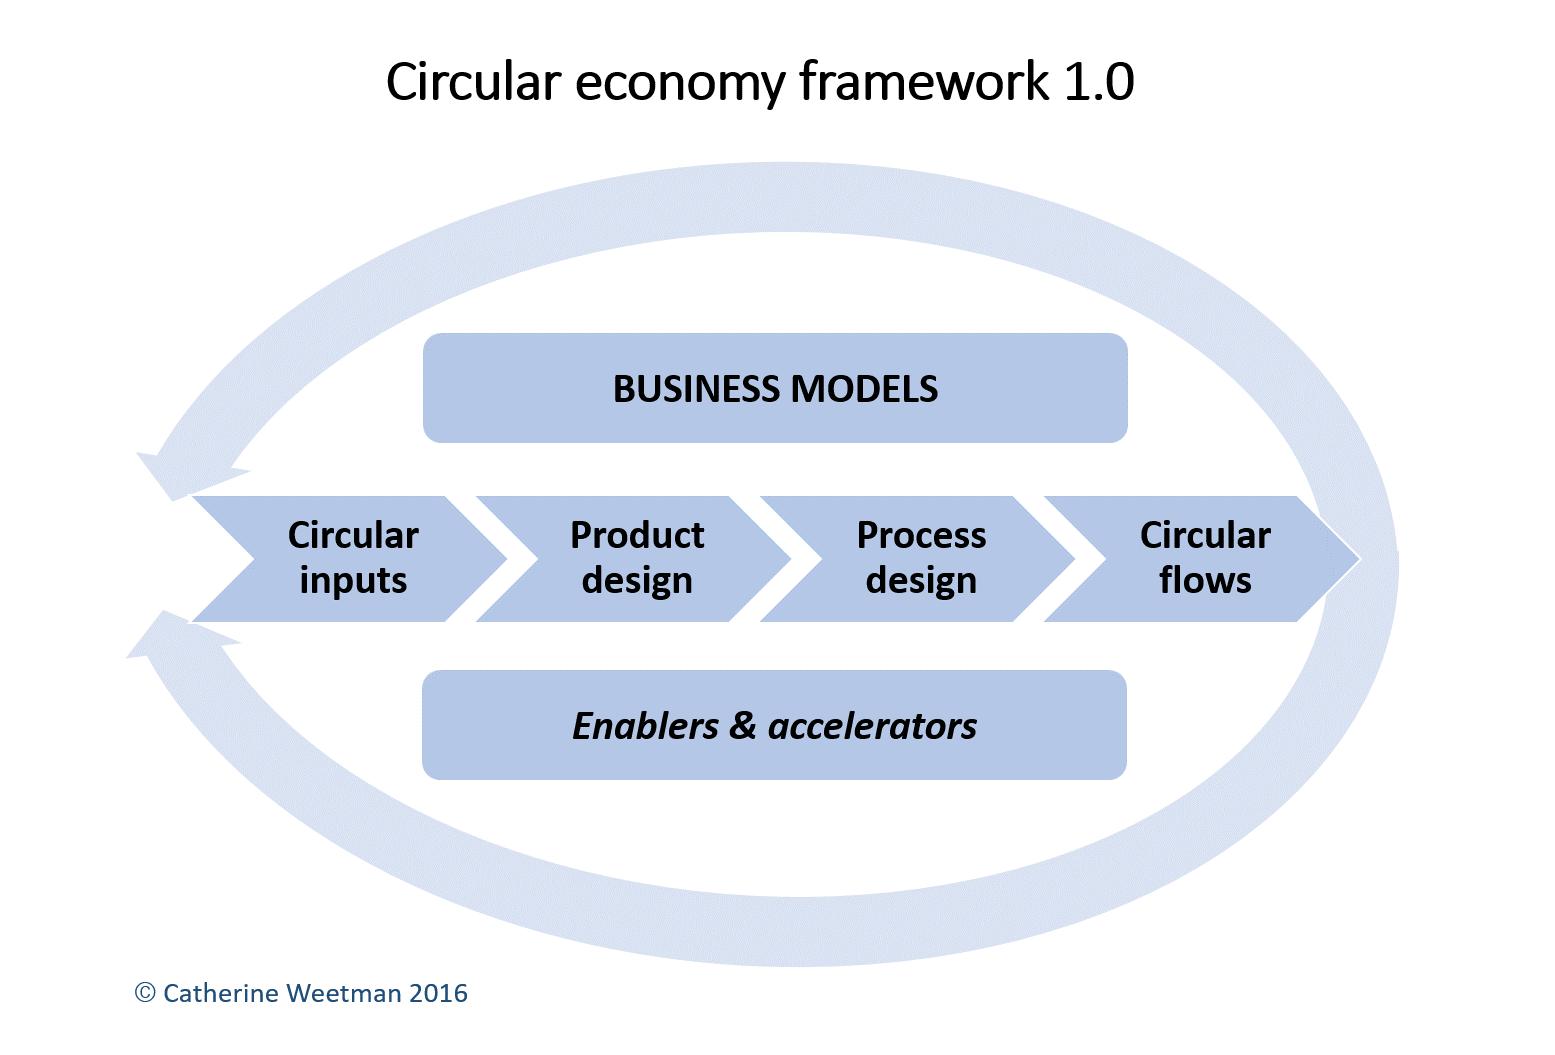 CE Framework 1.0